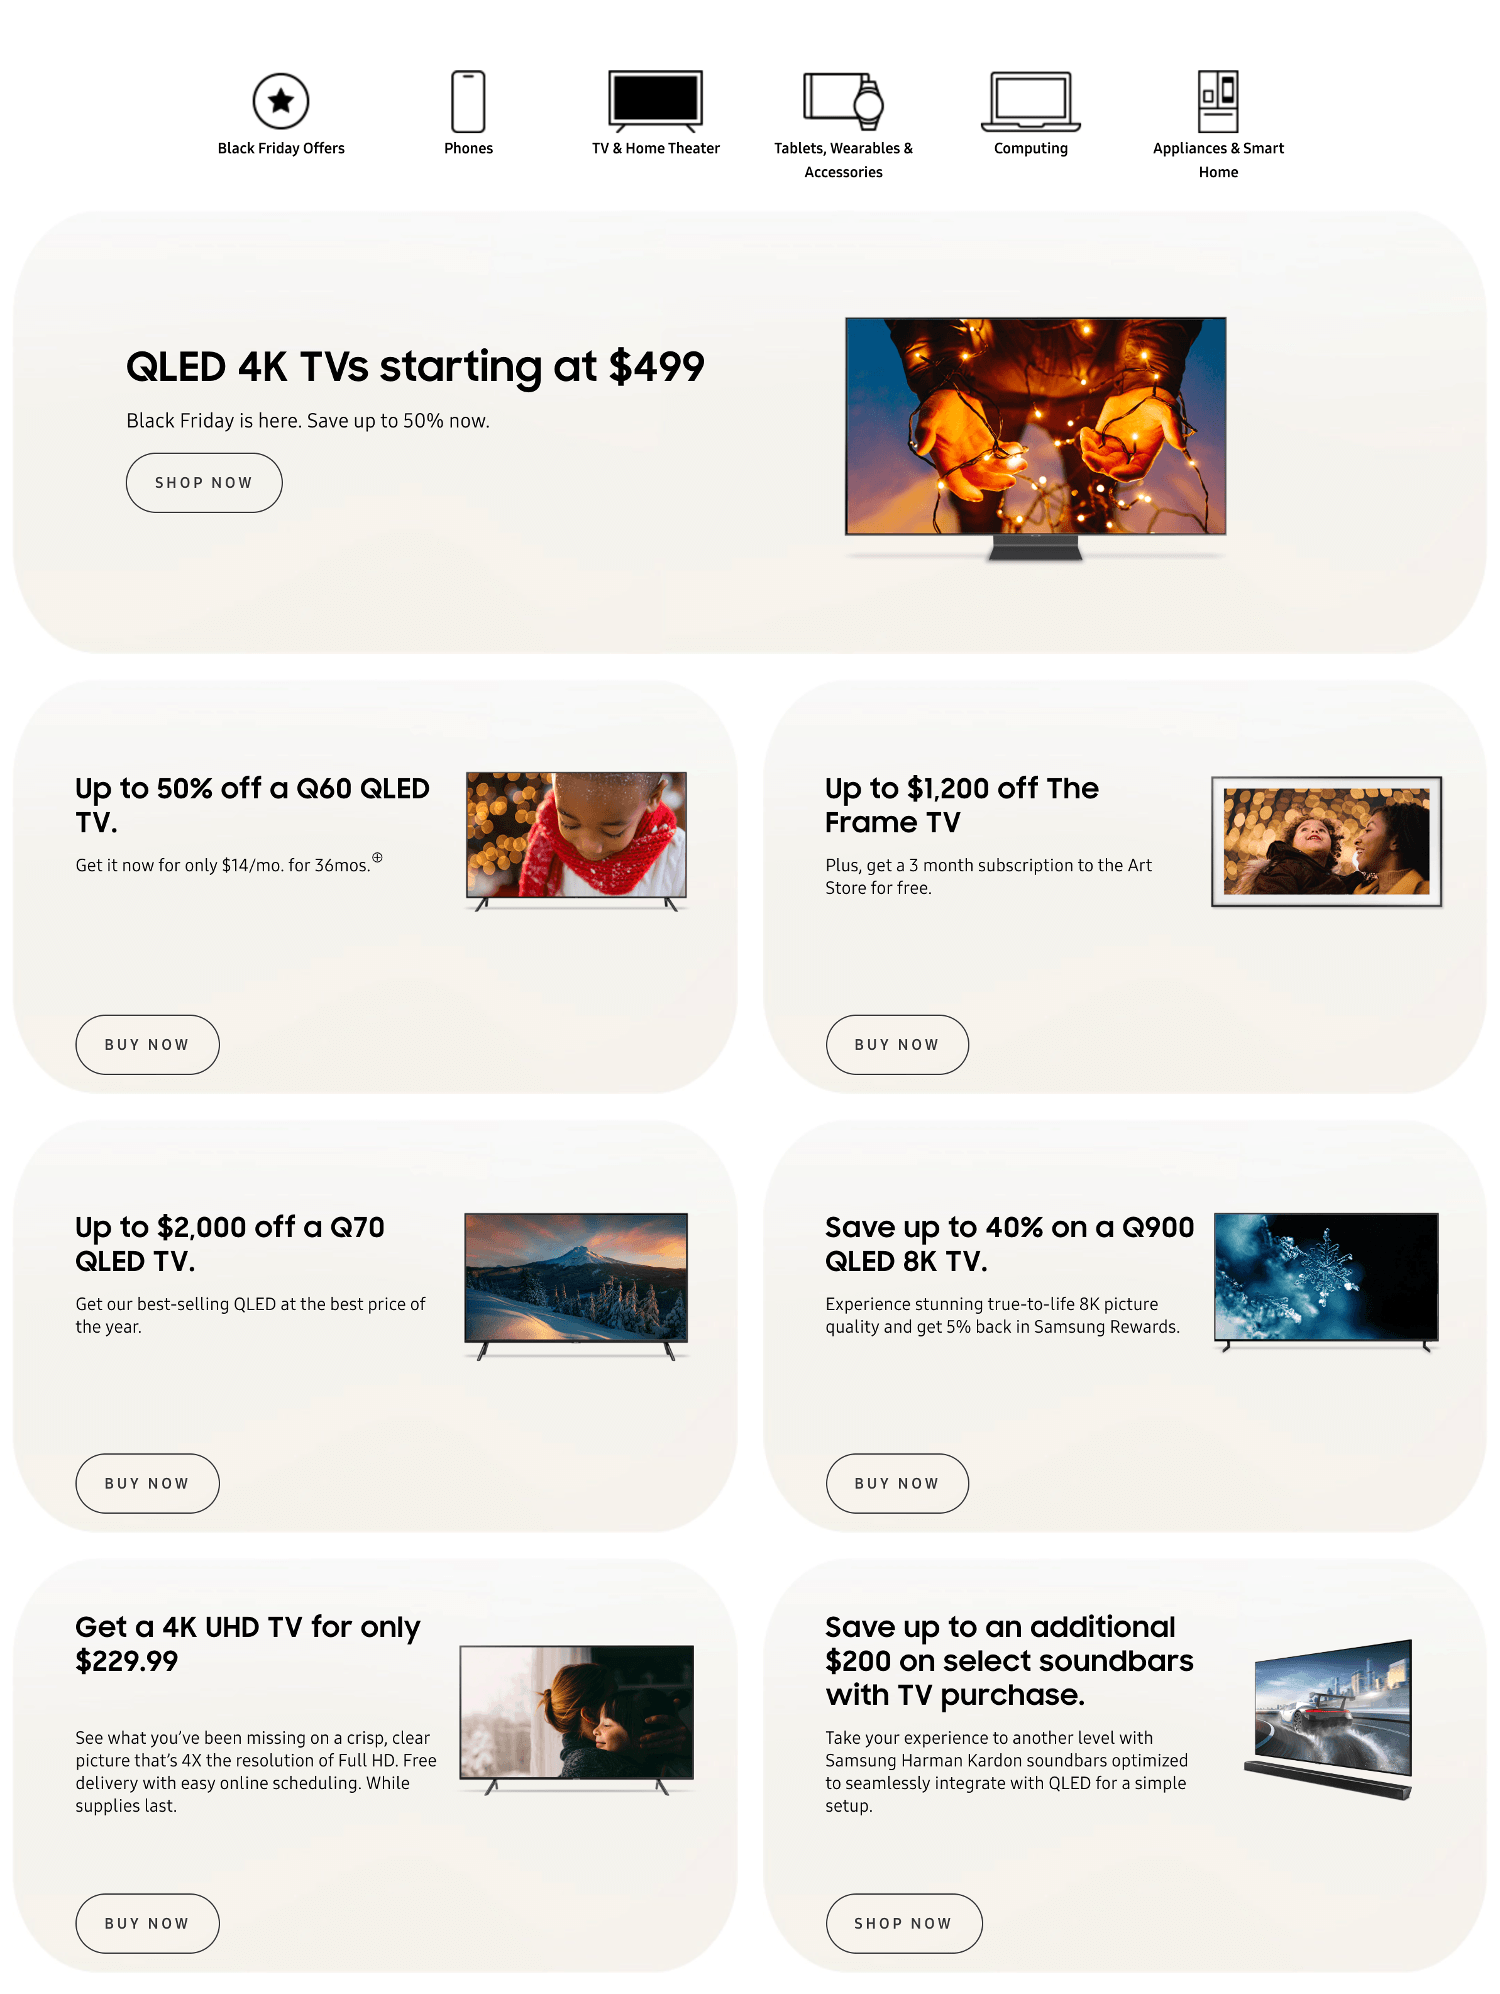 Samsung Black Friday 2019 Page 2